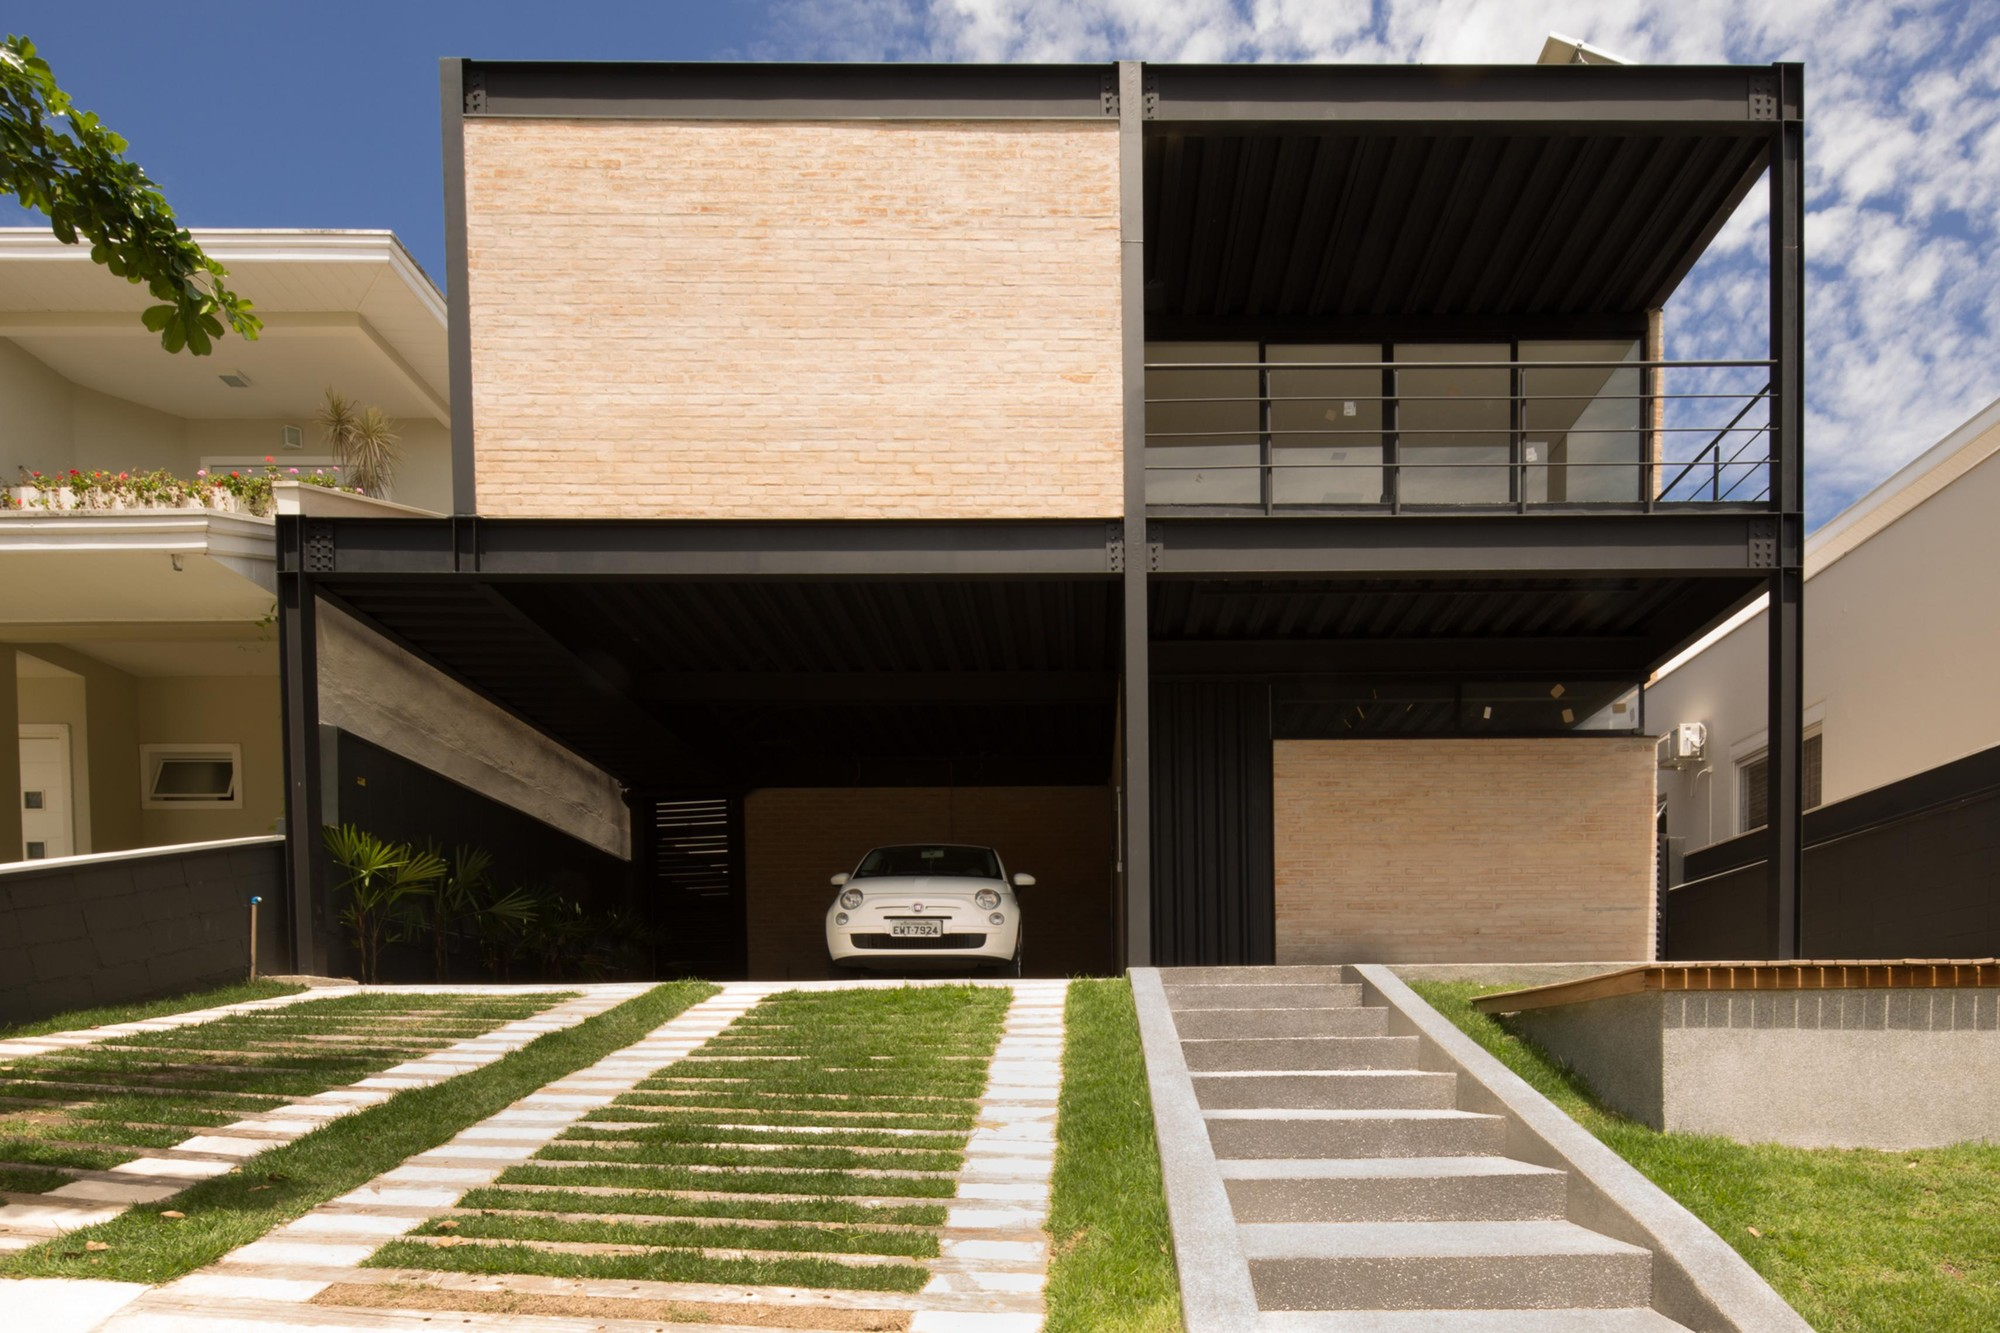 Gallery of house 63 sonne m ller arquiteto civitas 1 - Estructuras de acero para casas ...